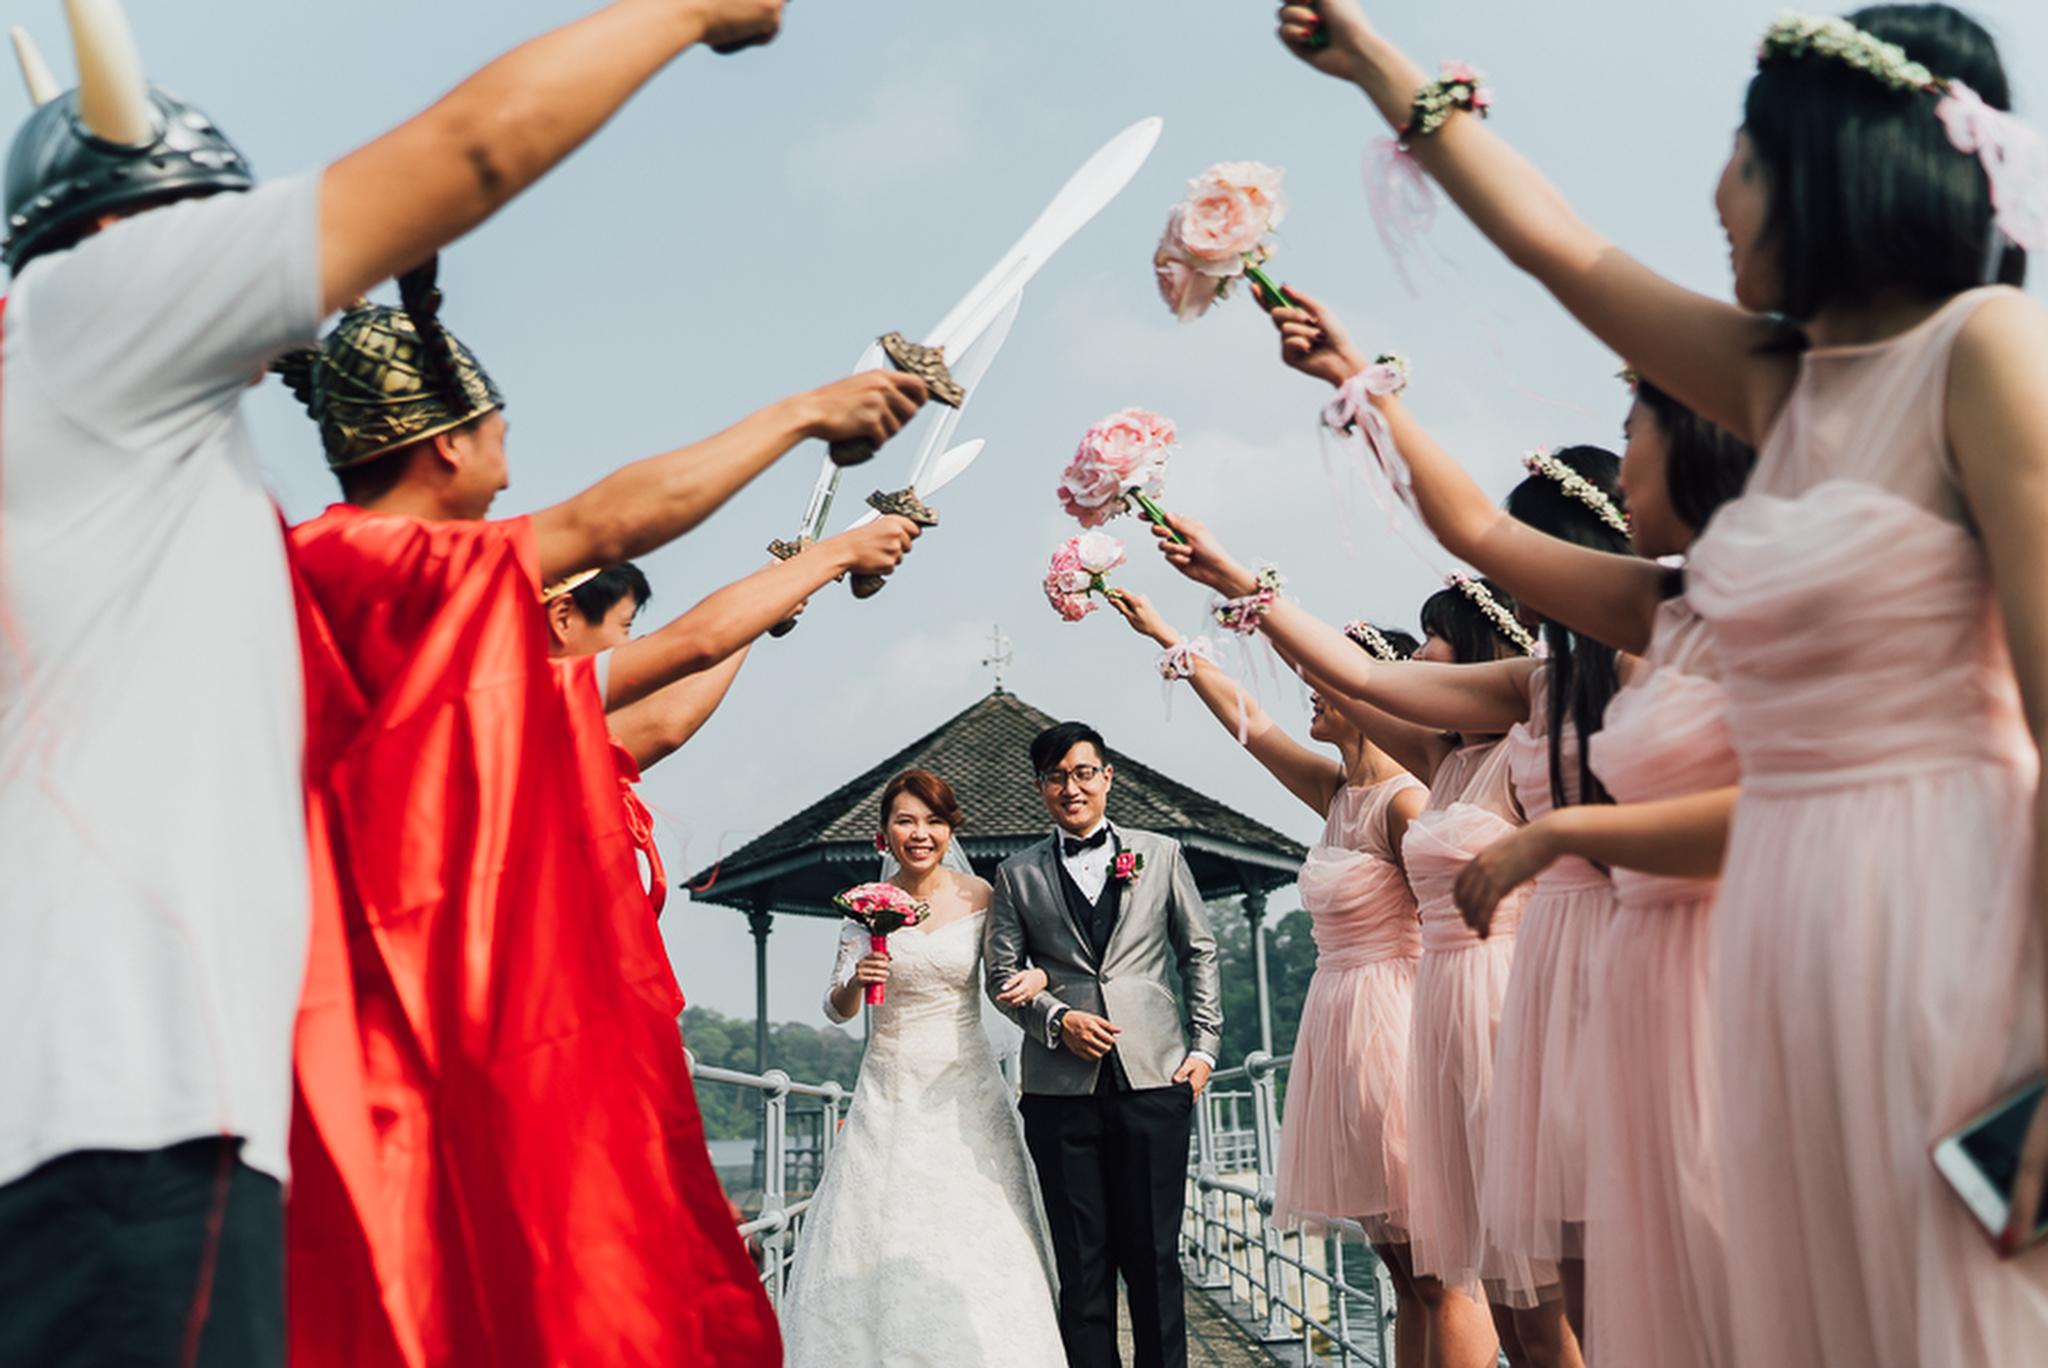 Singapore Wedding Photographer - Alvin & Mischelle Actual Day Wedding (37 of 86).JPG